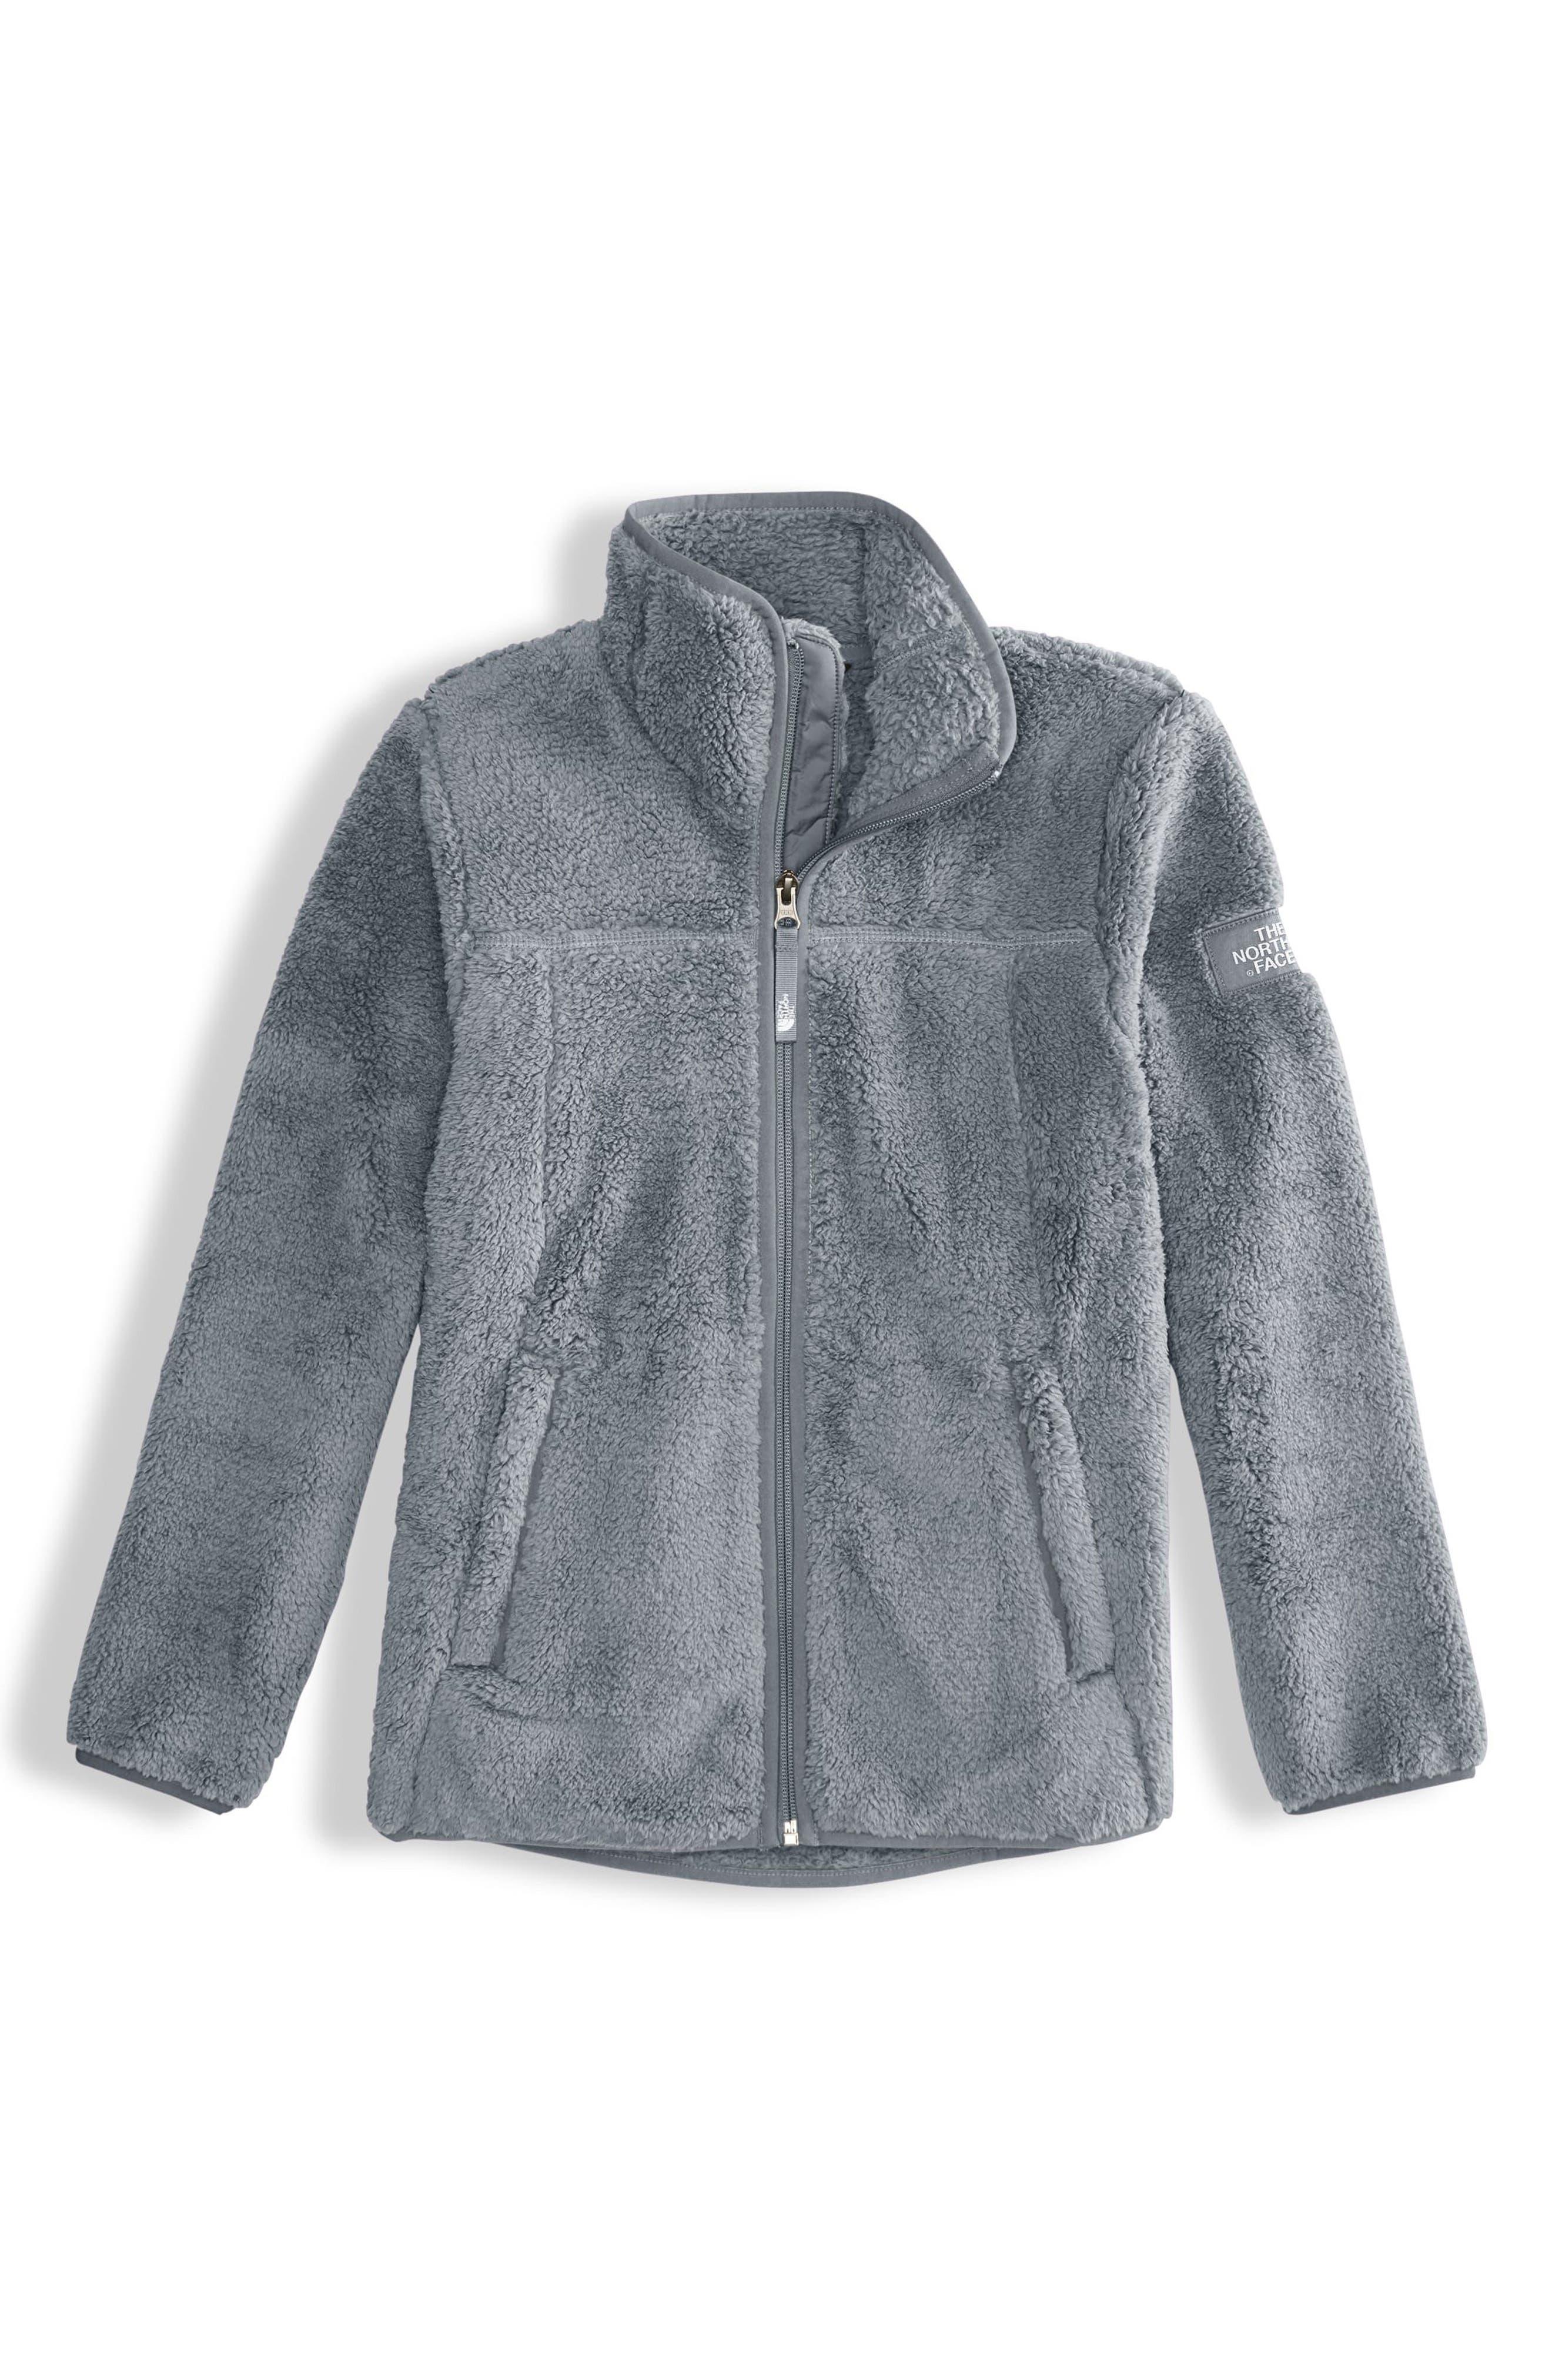 Campshire Fleece Jacket,                             Main thumbnail 1, color,                             Mid Grey